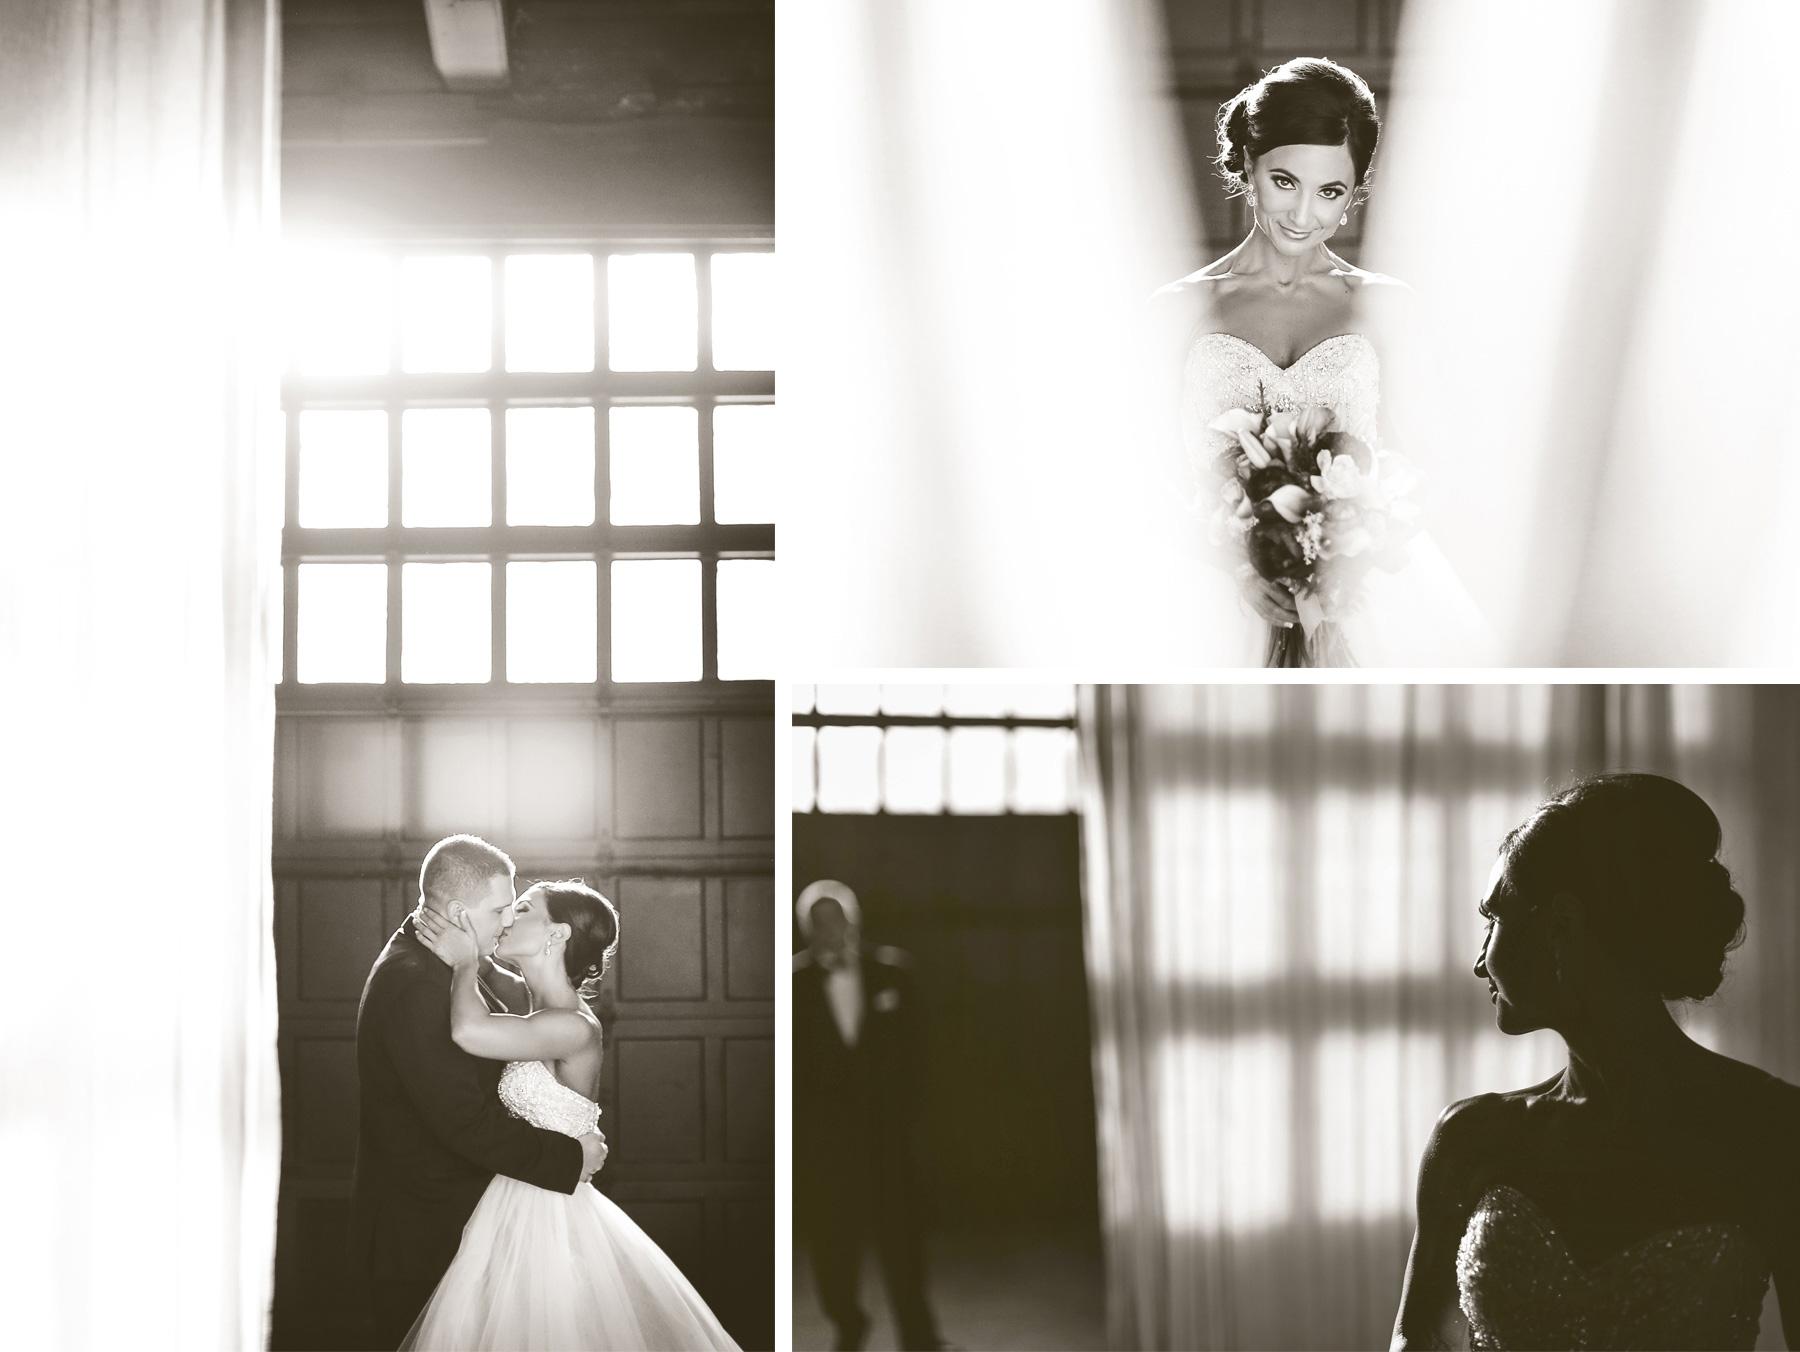 05-Minneapolis-Minnesota-Wedding-Photography-Aria-Downtown-Industrial-Warehouse-Melanie-and-Andrew.jpg